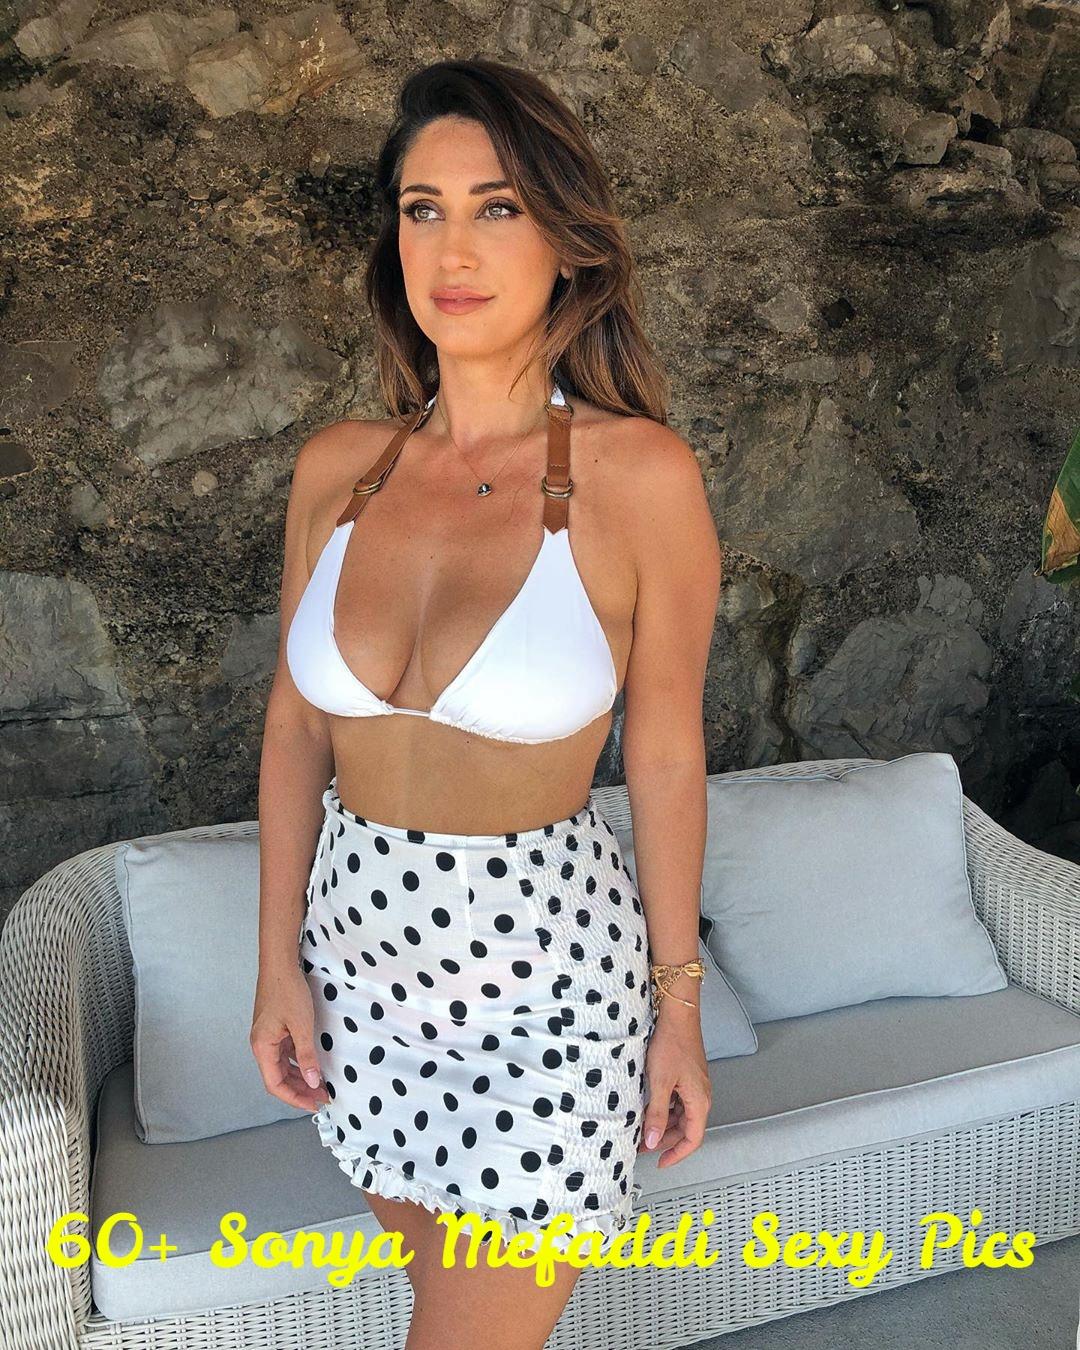 Sonya Mefaddi sexy pic